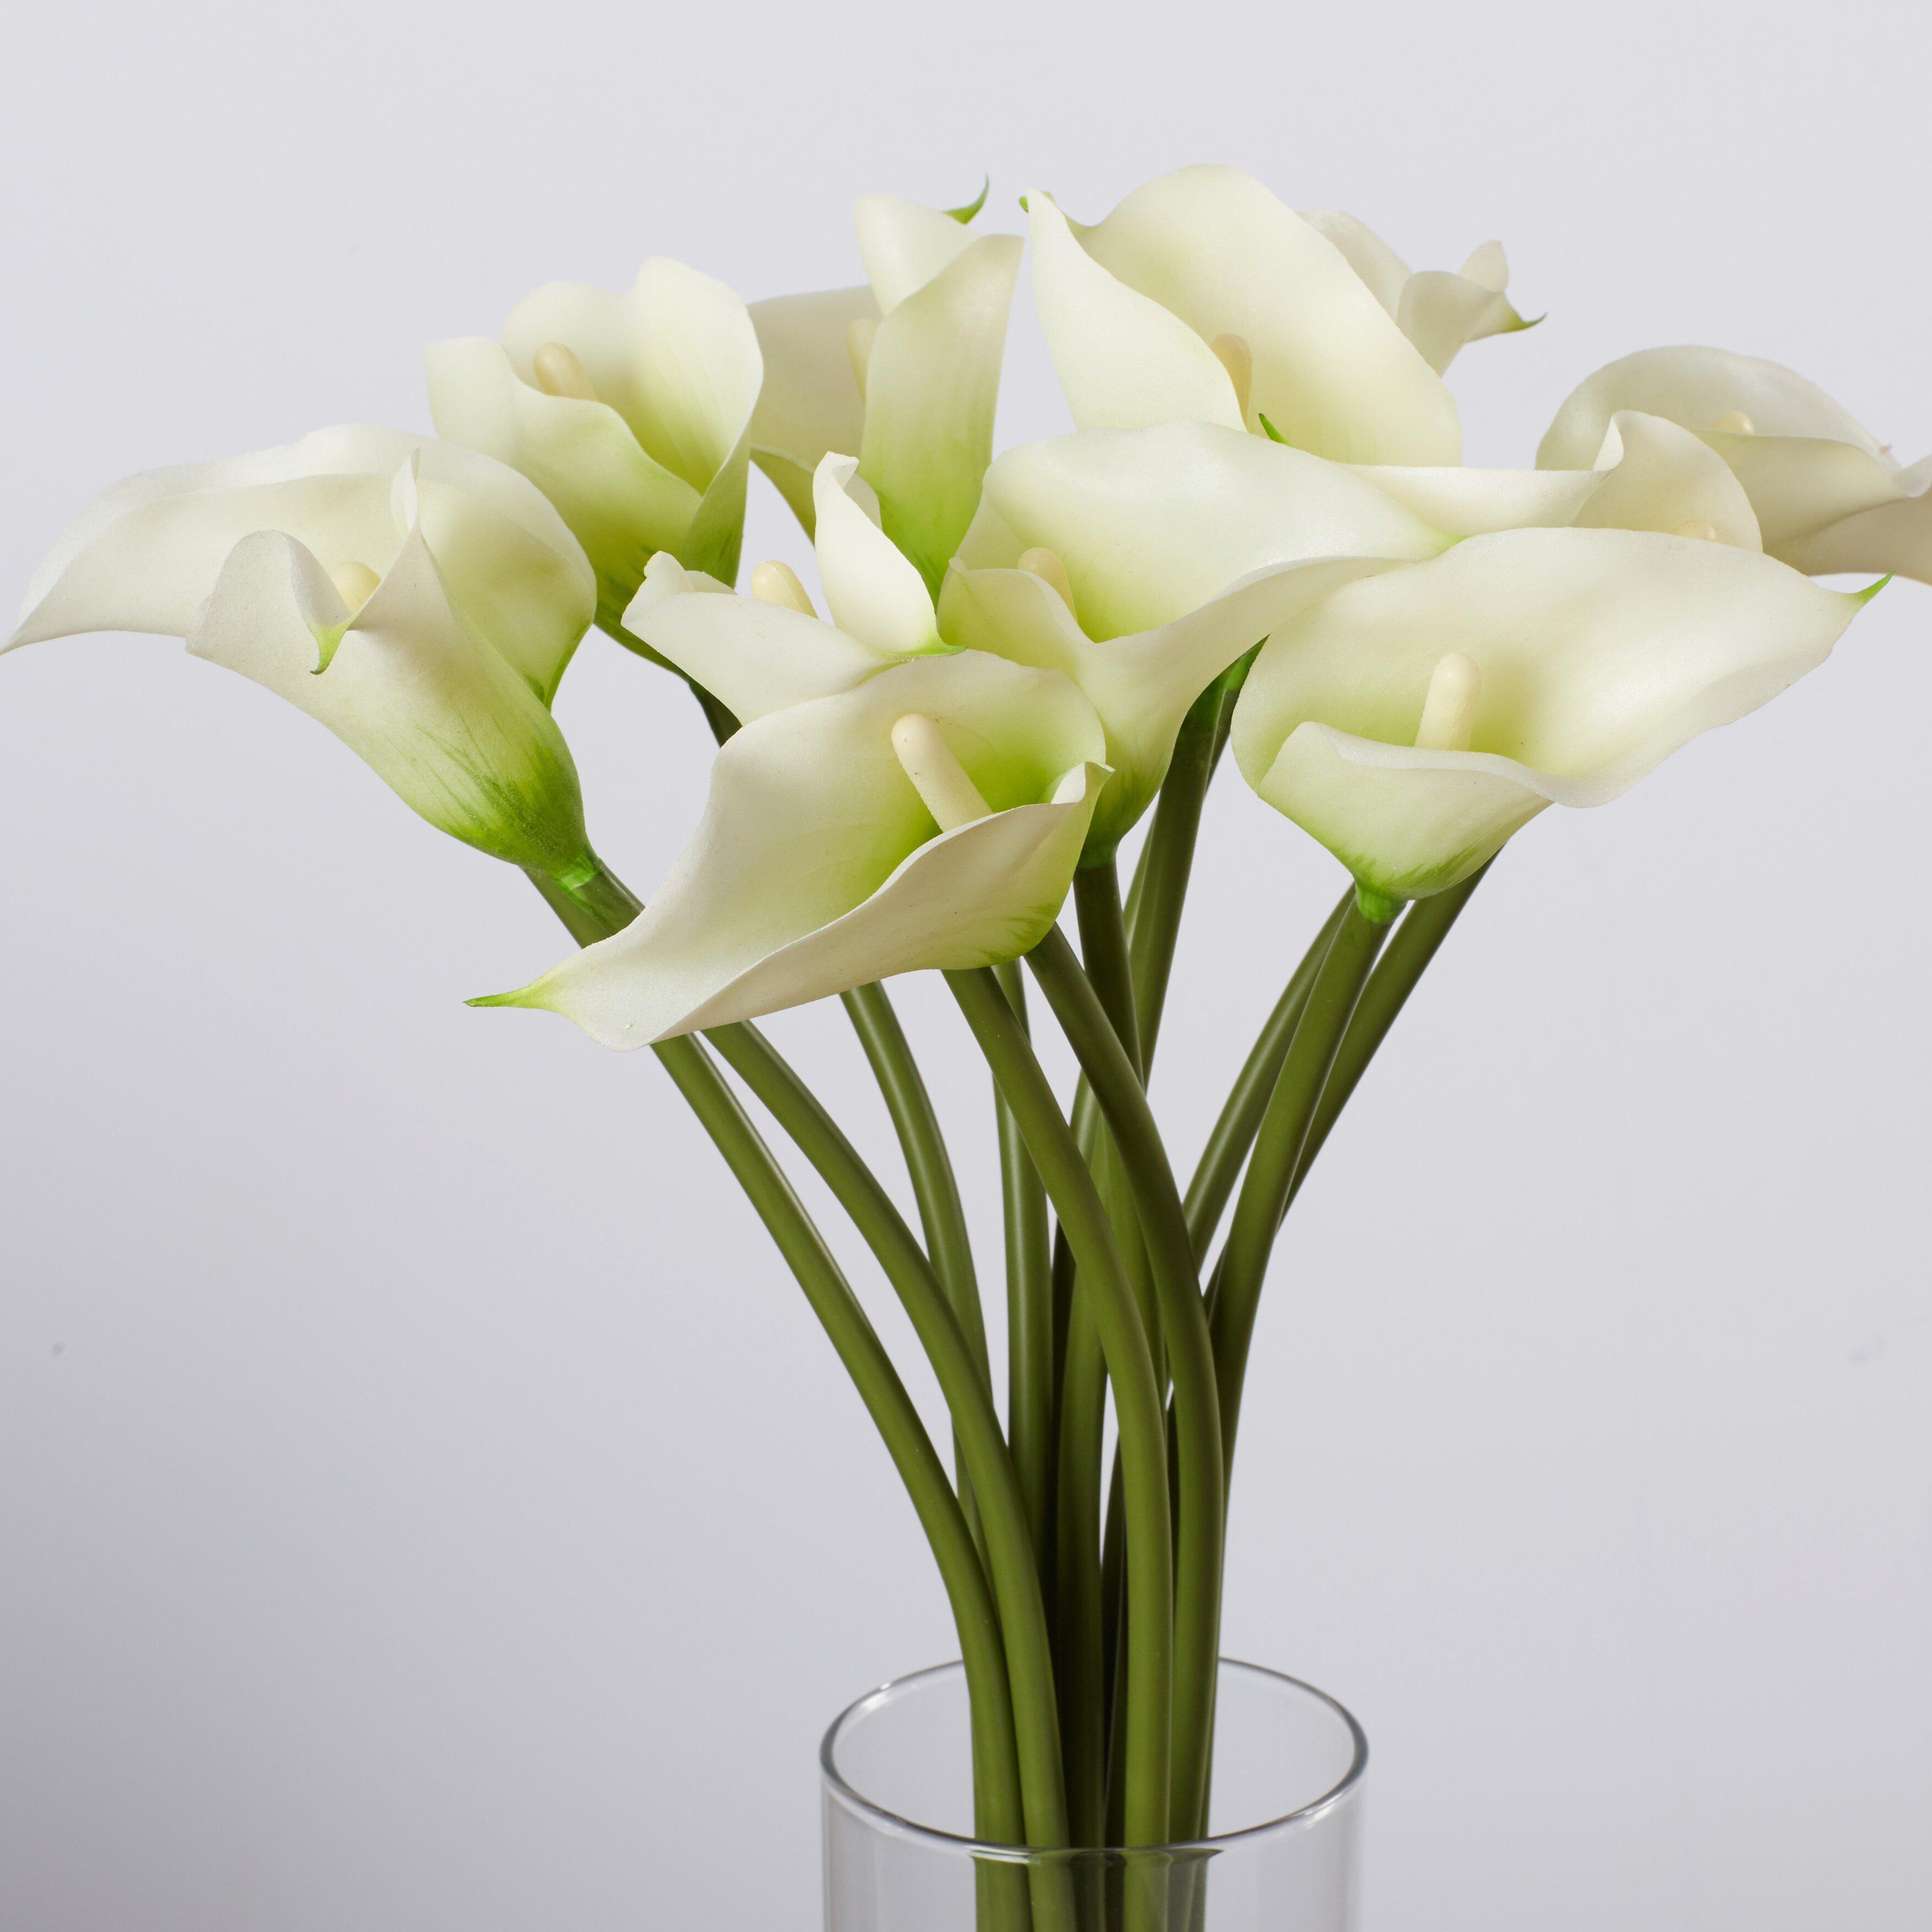 House of hampton calla lily flower arrangement in flower for Calla lily flower meaning